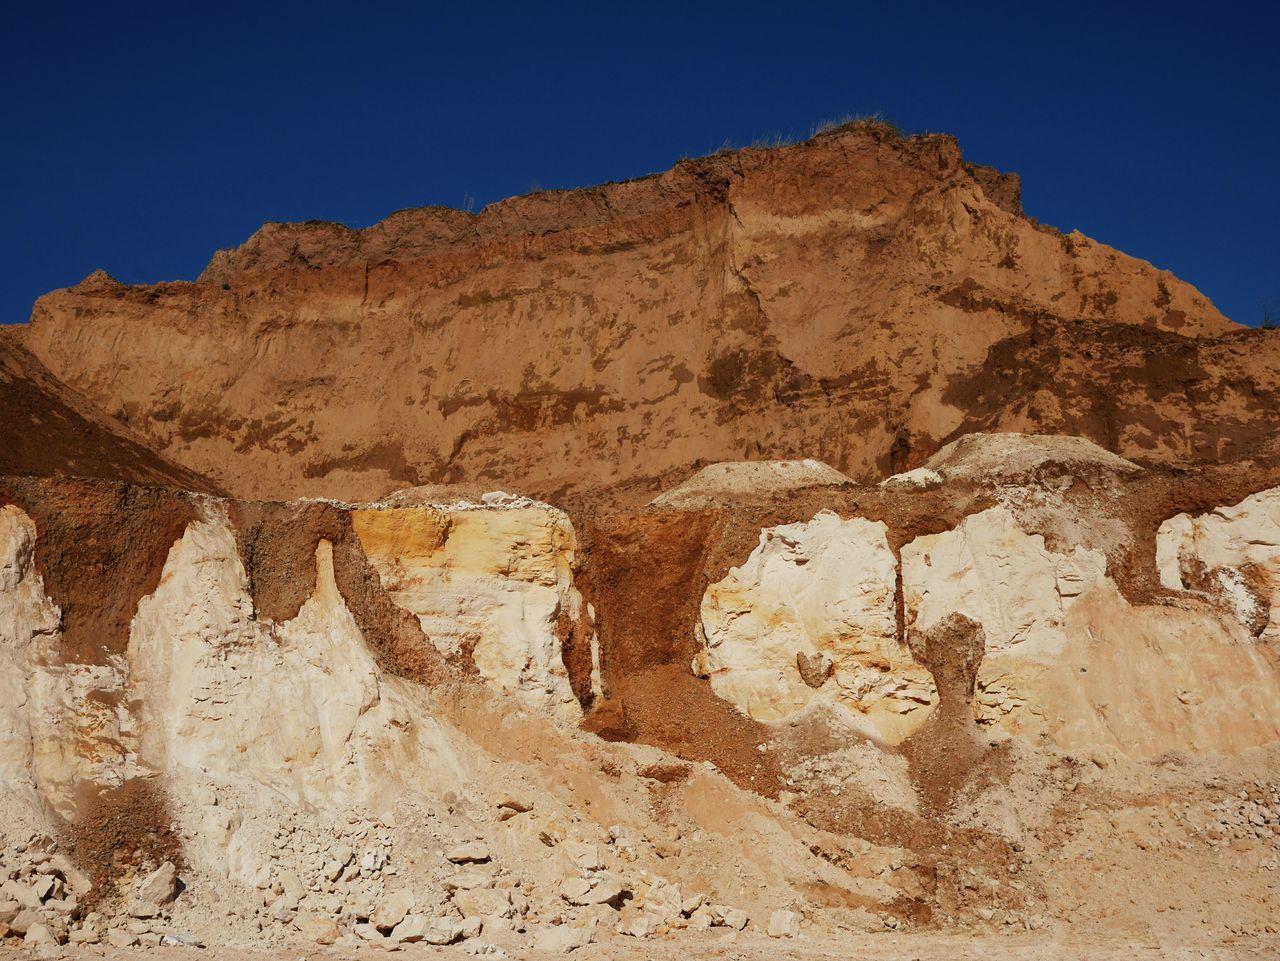 Desert Sand Dune Sand No People Day Outdoors Nature Riemst Cliff Tranquility Beauty In Nature Landscape Zichen Zussen Bolder Blue Sky